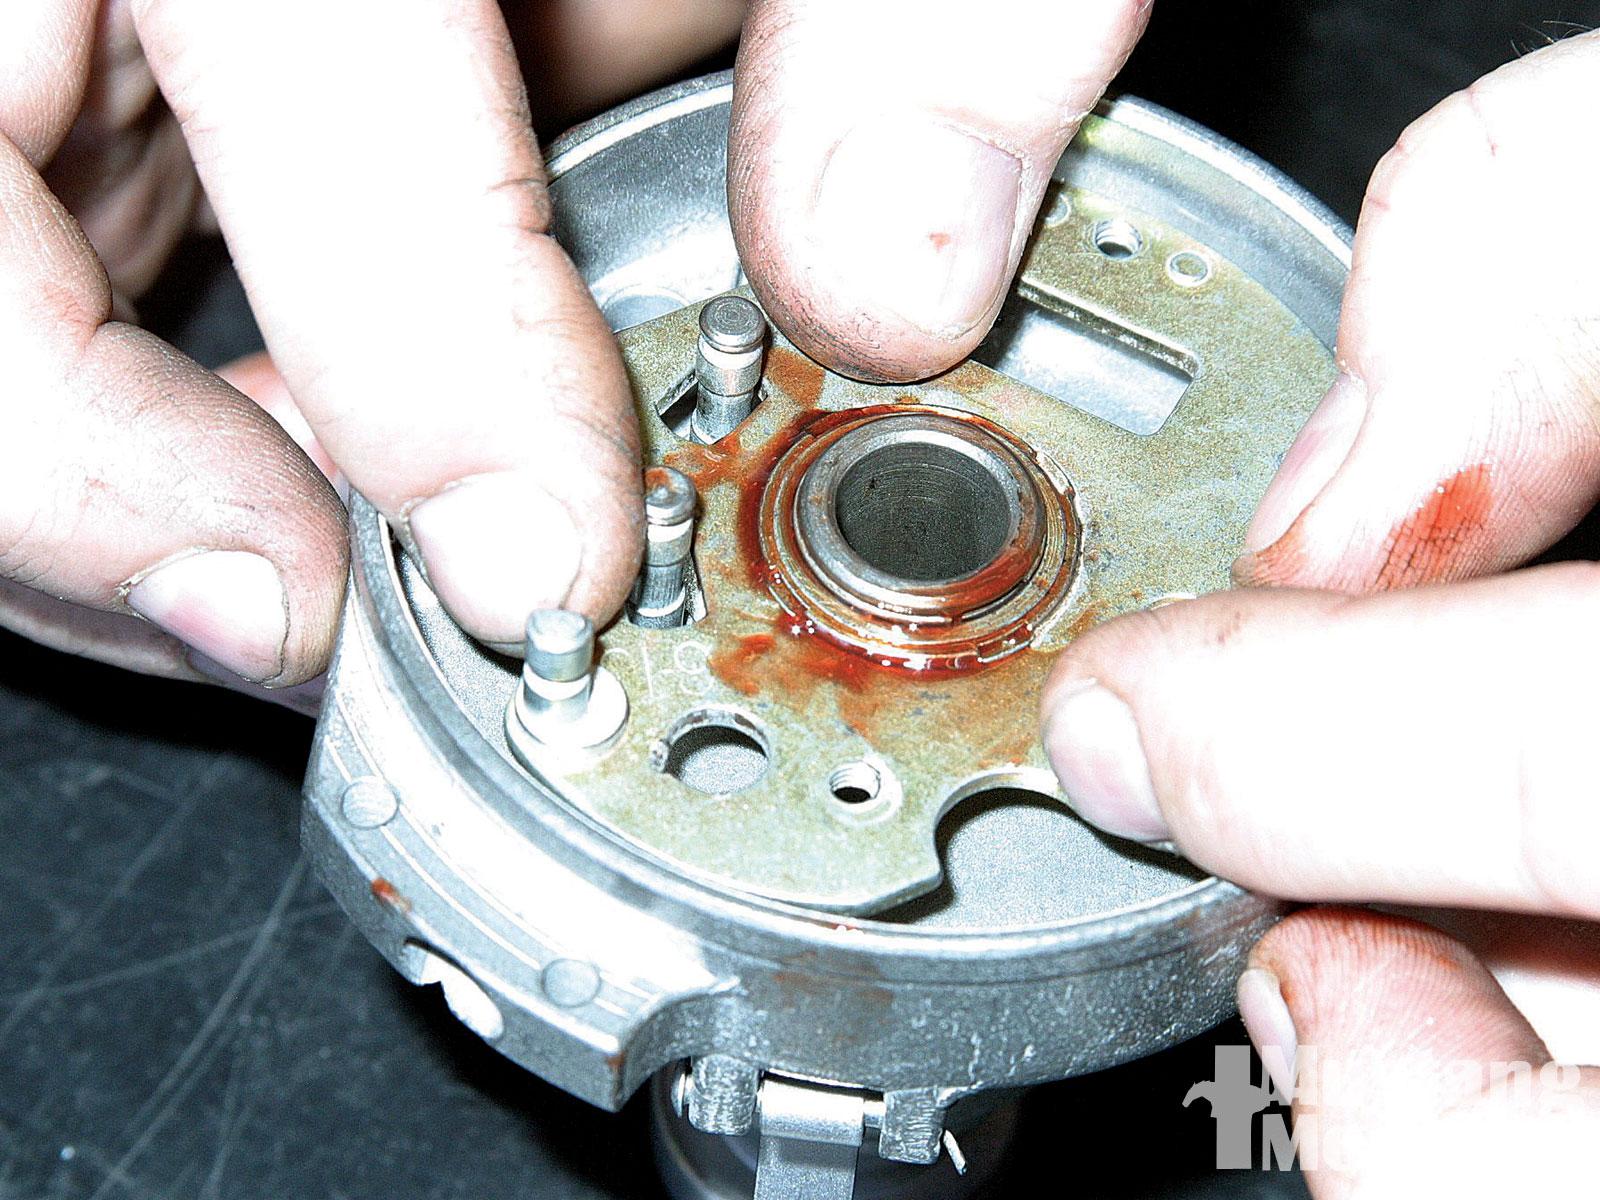 Mump 1001 07  Autolite Loadomatic Distributor Rebuild Breaker Plate Pivot